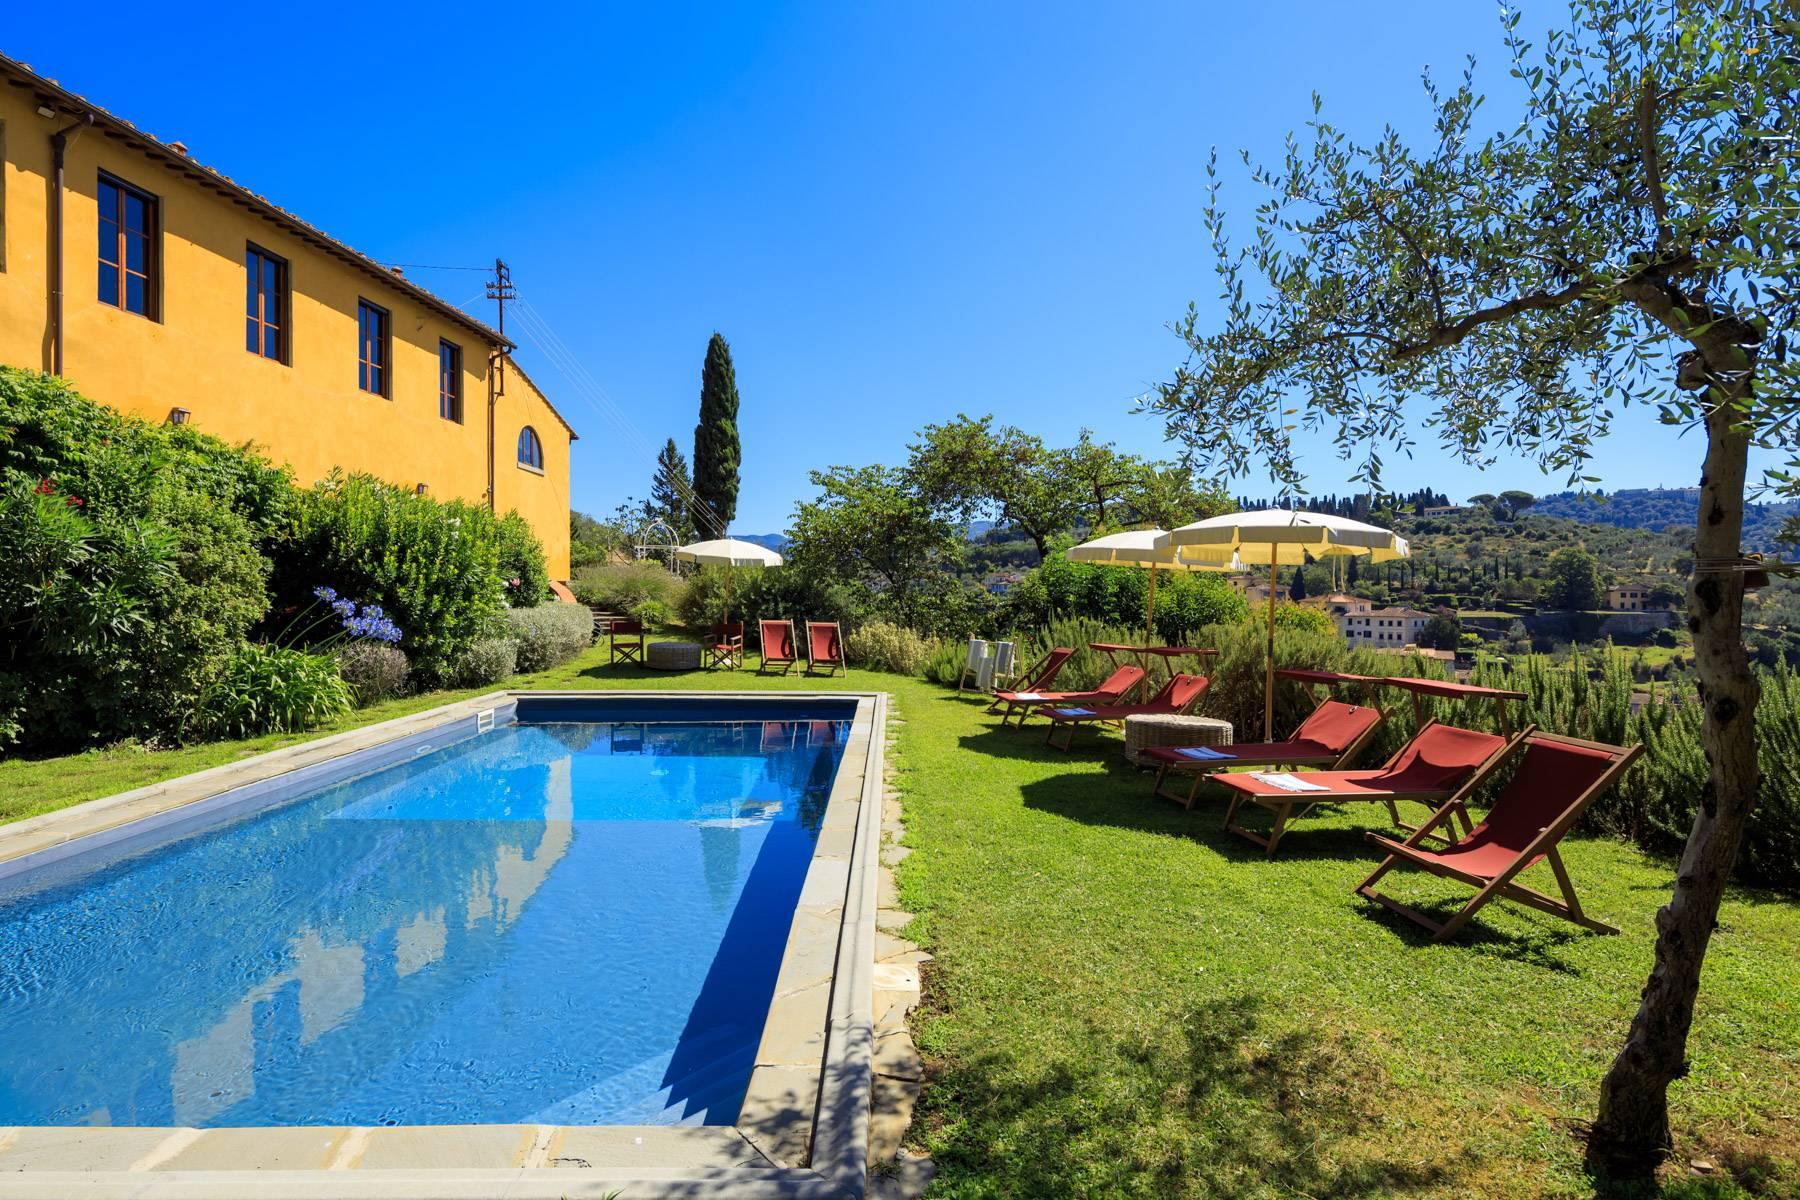 Villa in Affitto a Firenze: 5 locali, 600 mq - Foto 2